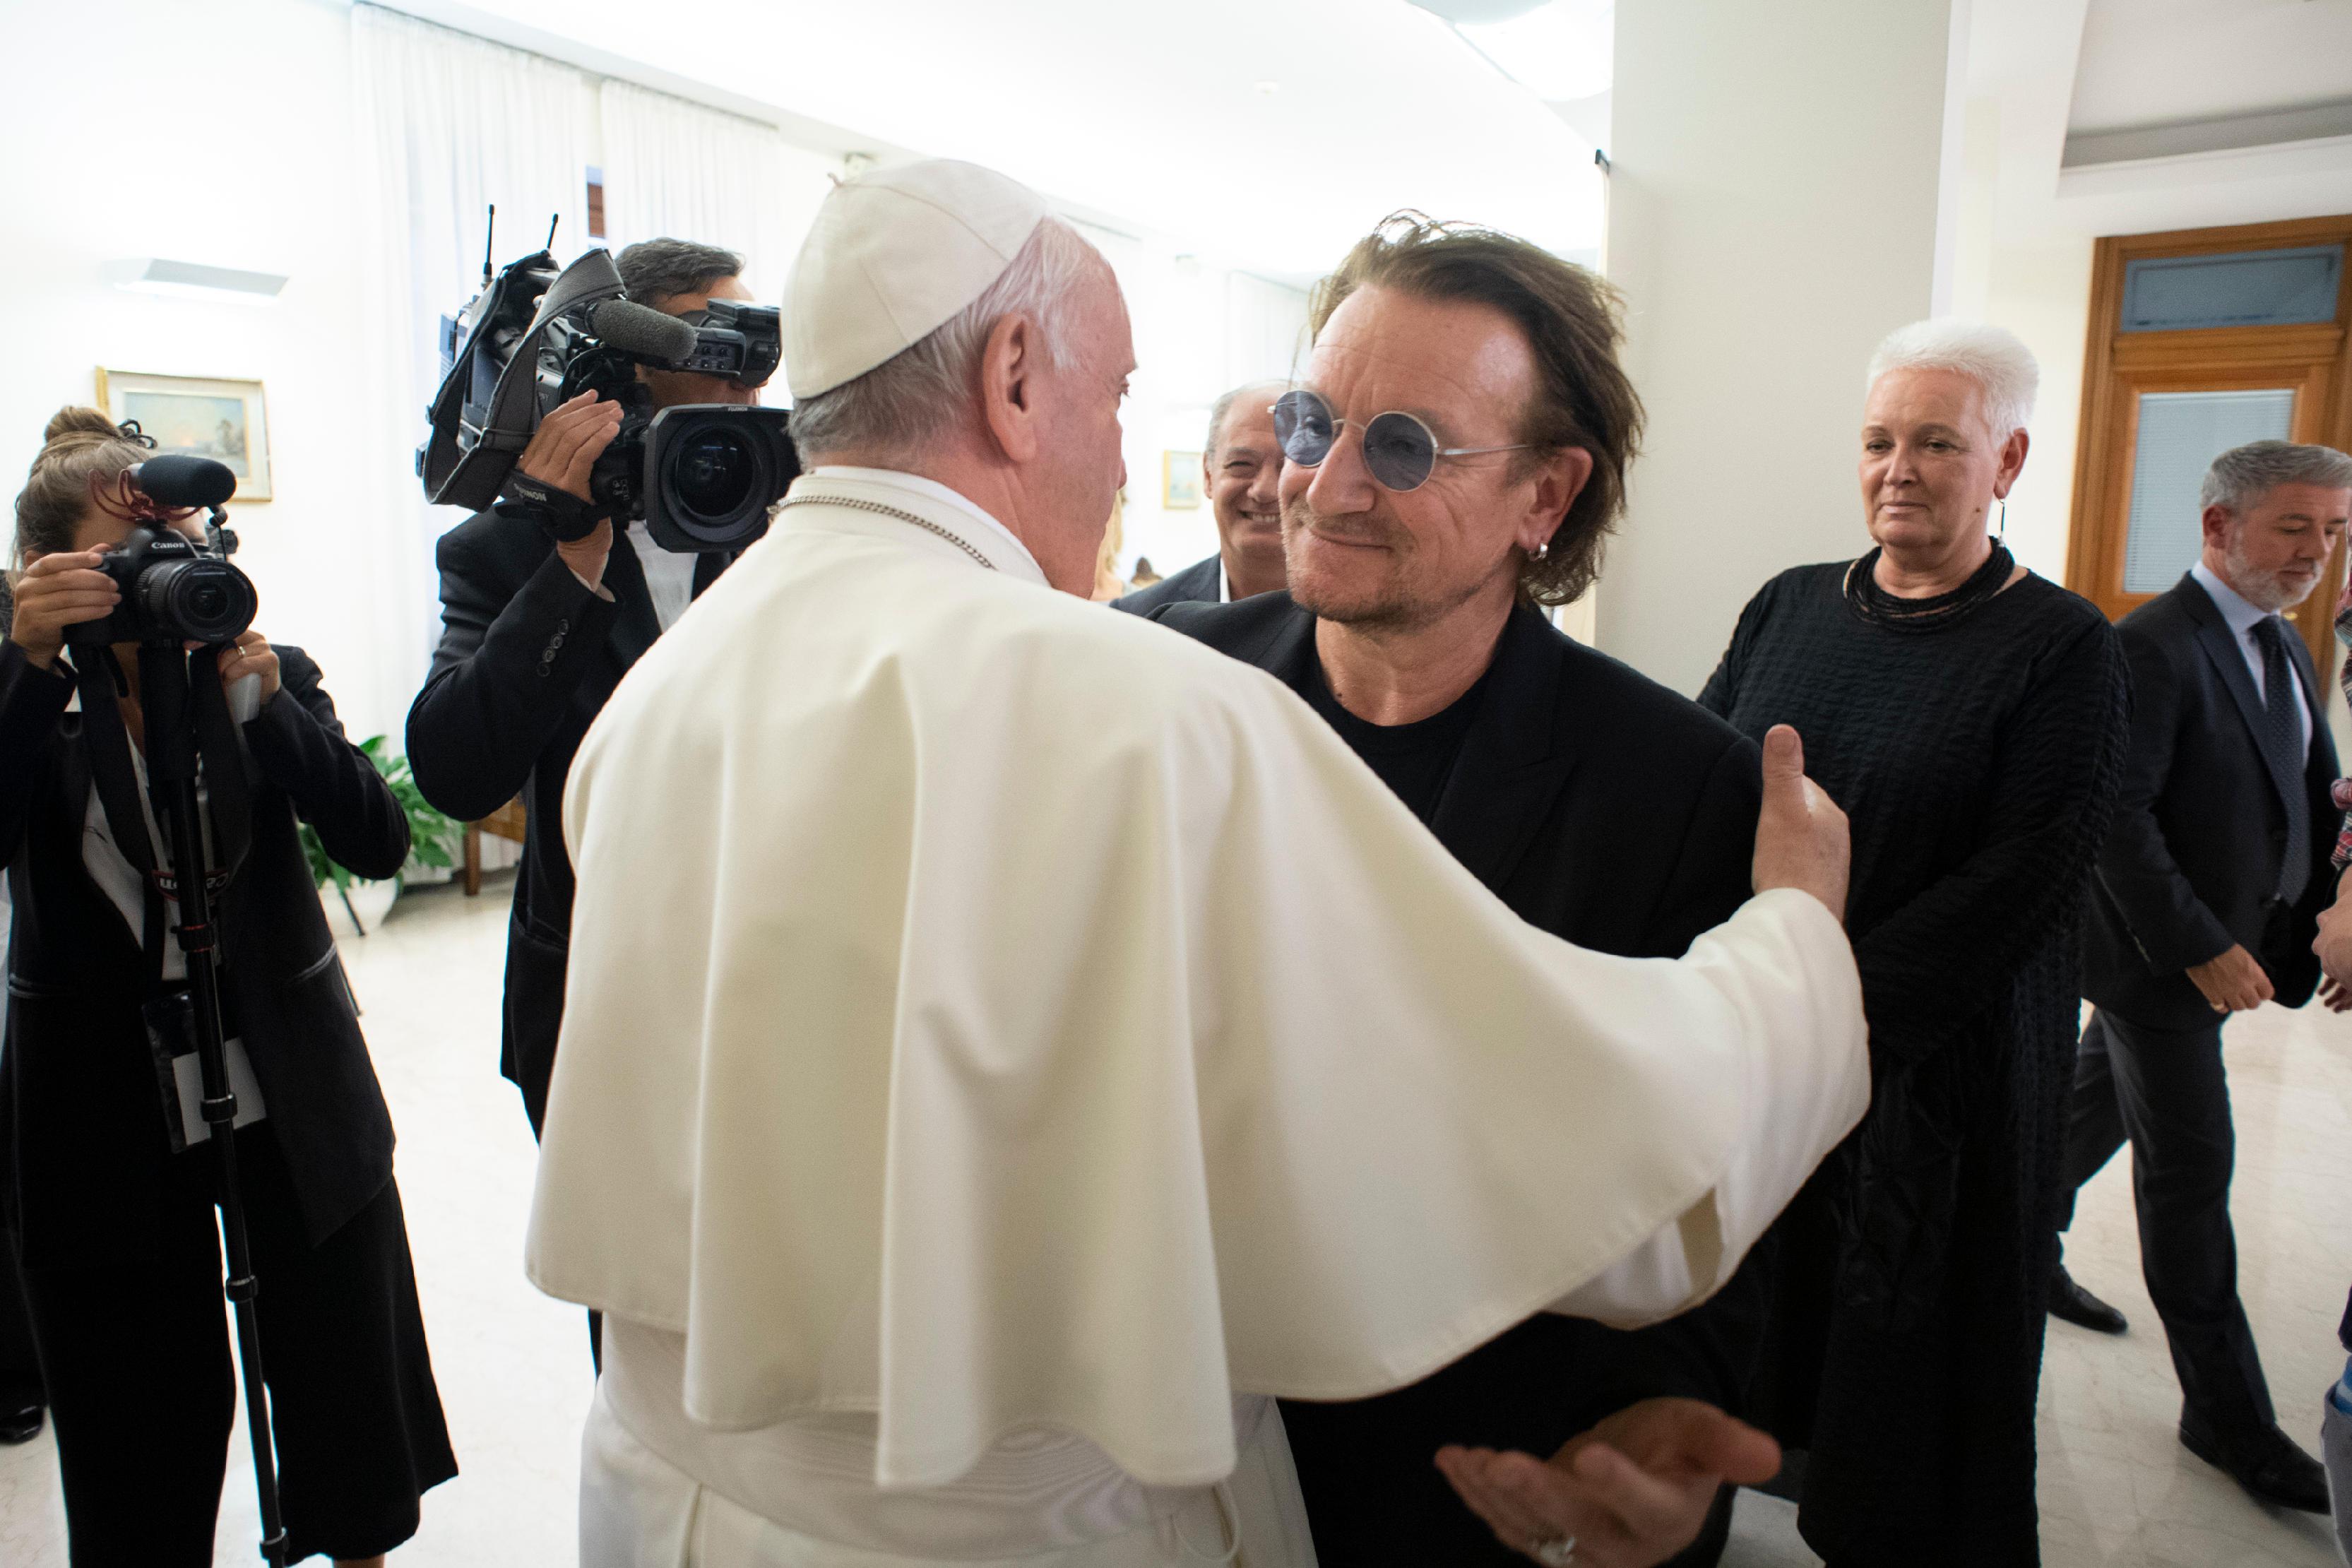 Francisco abraza a Bono Vox, cantante de U2 © Vatican Media